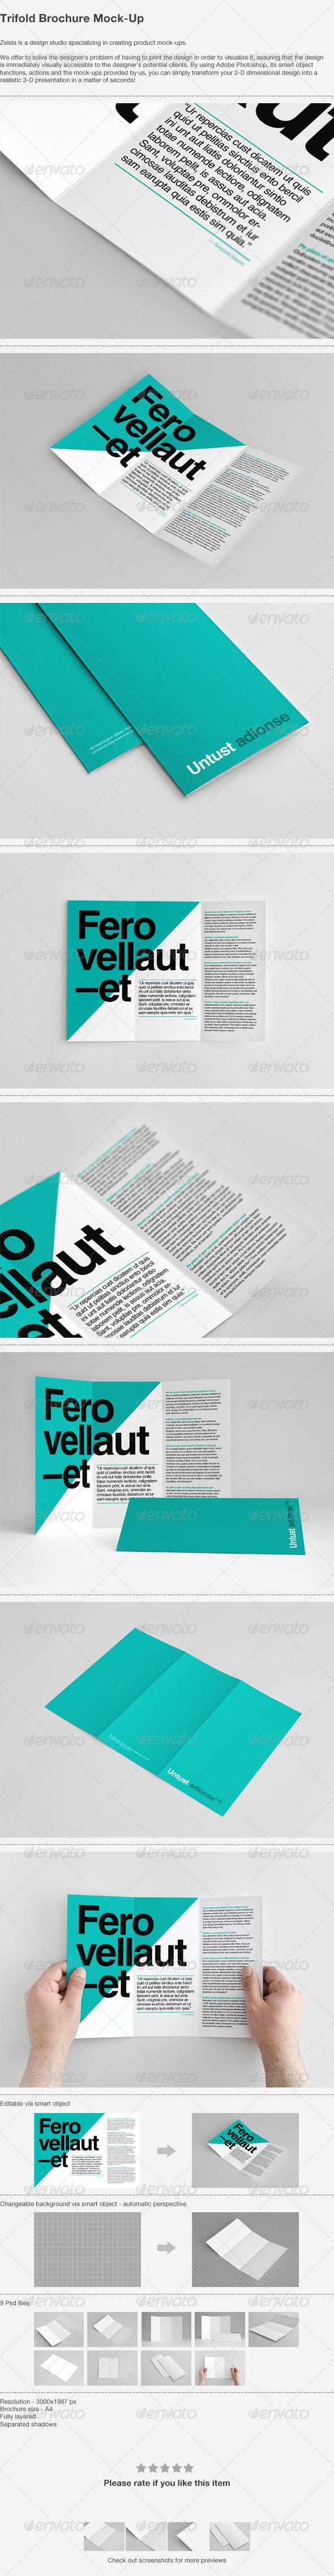 Trifold Brochure Mock-Up